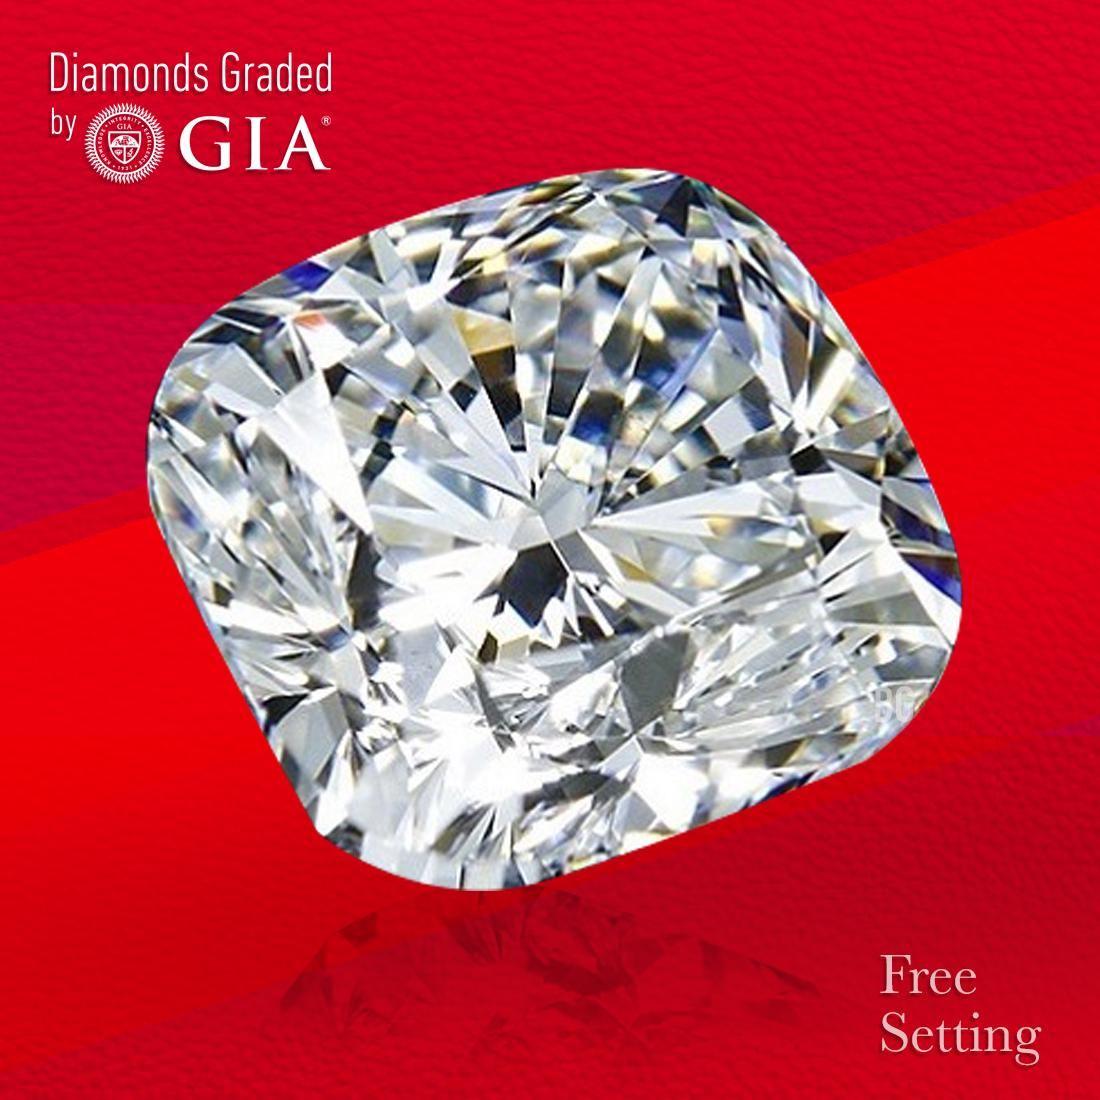 3.51 ct, Color F/VVS2, Cushion cut GIA Graded Diamond